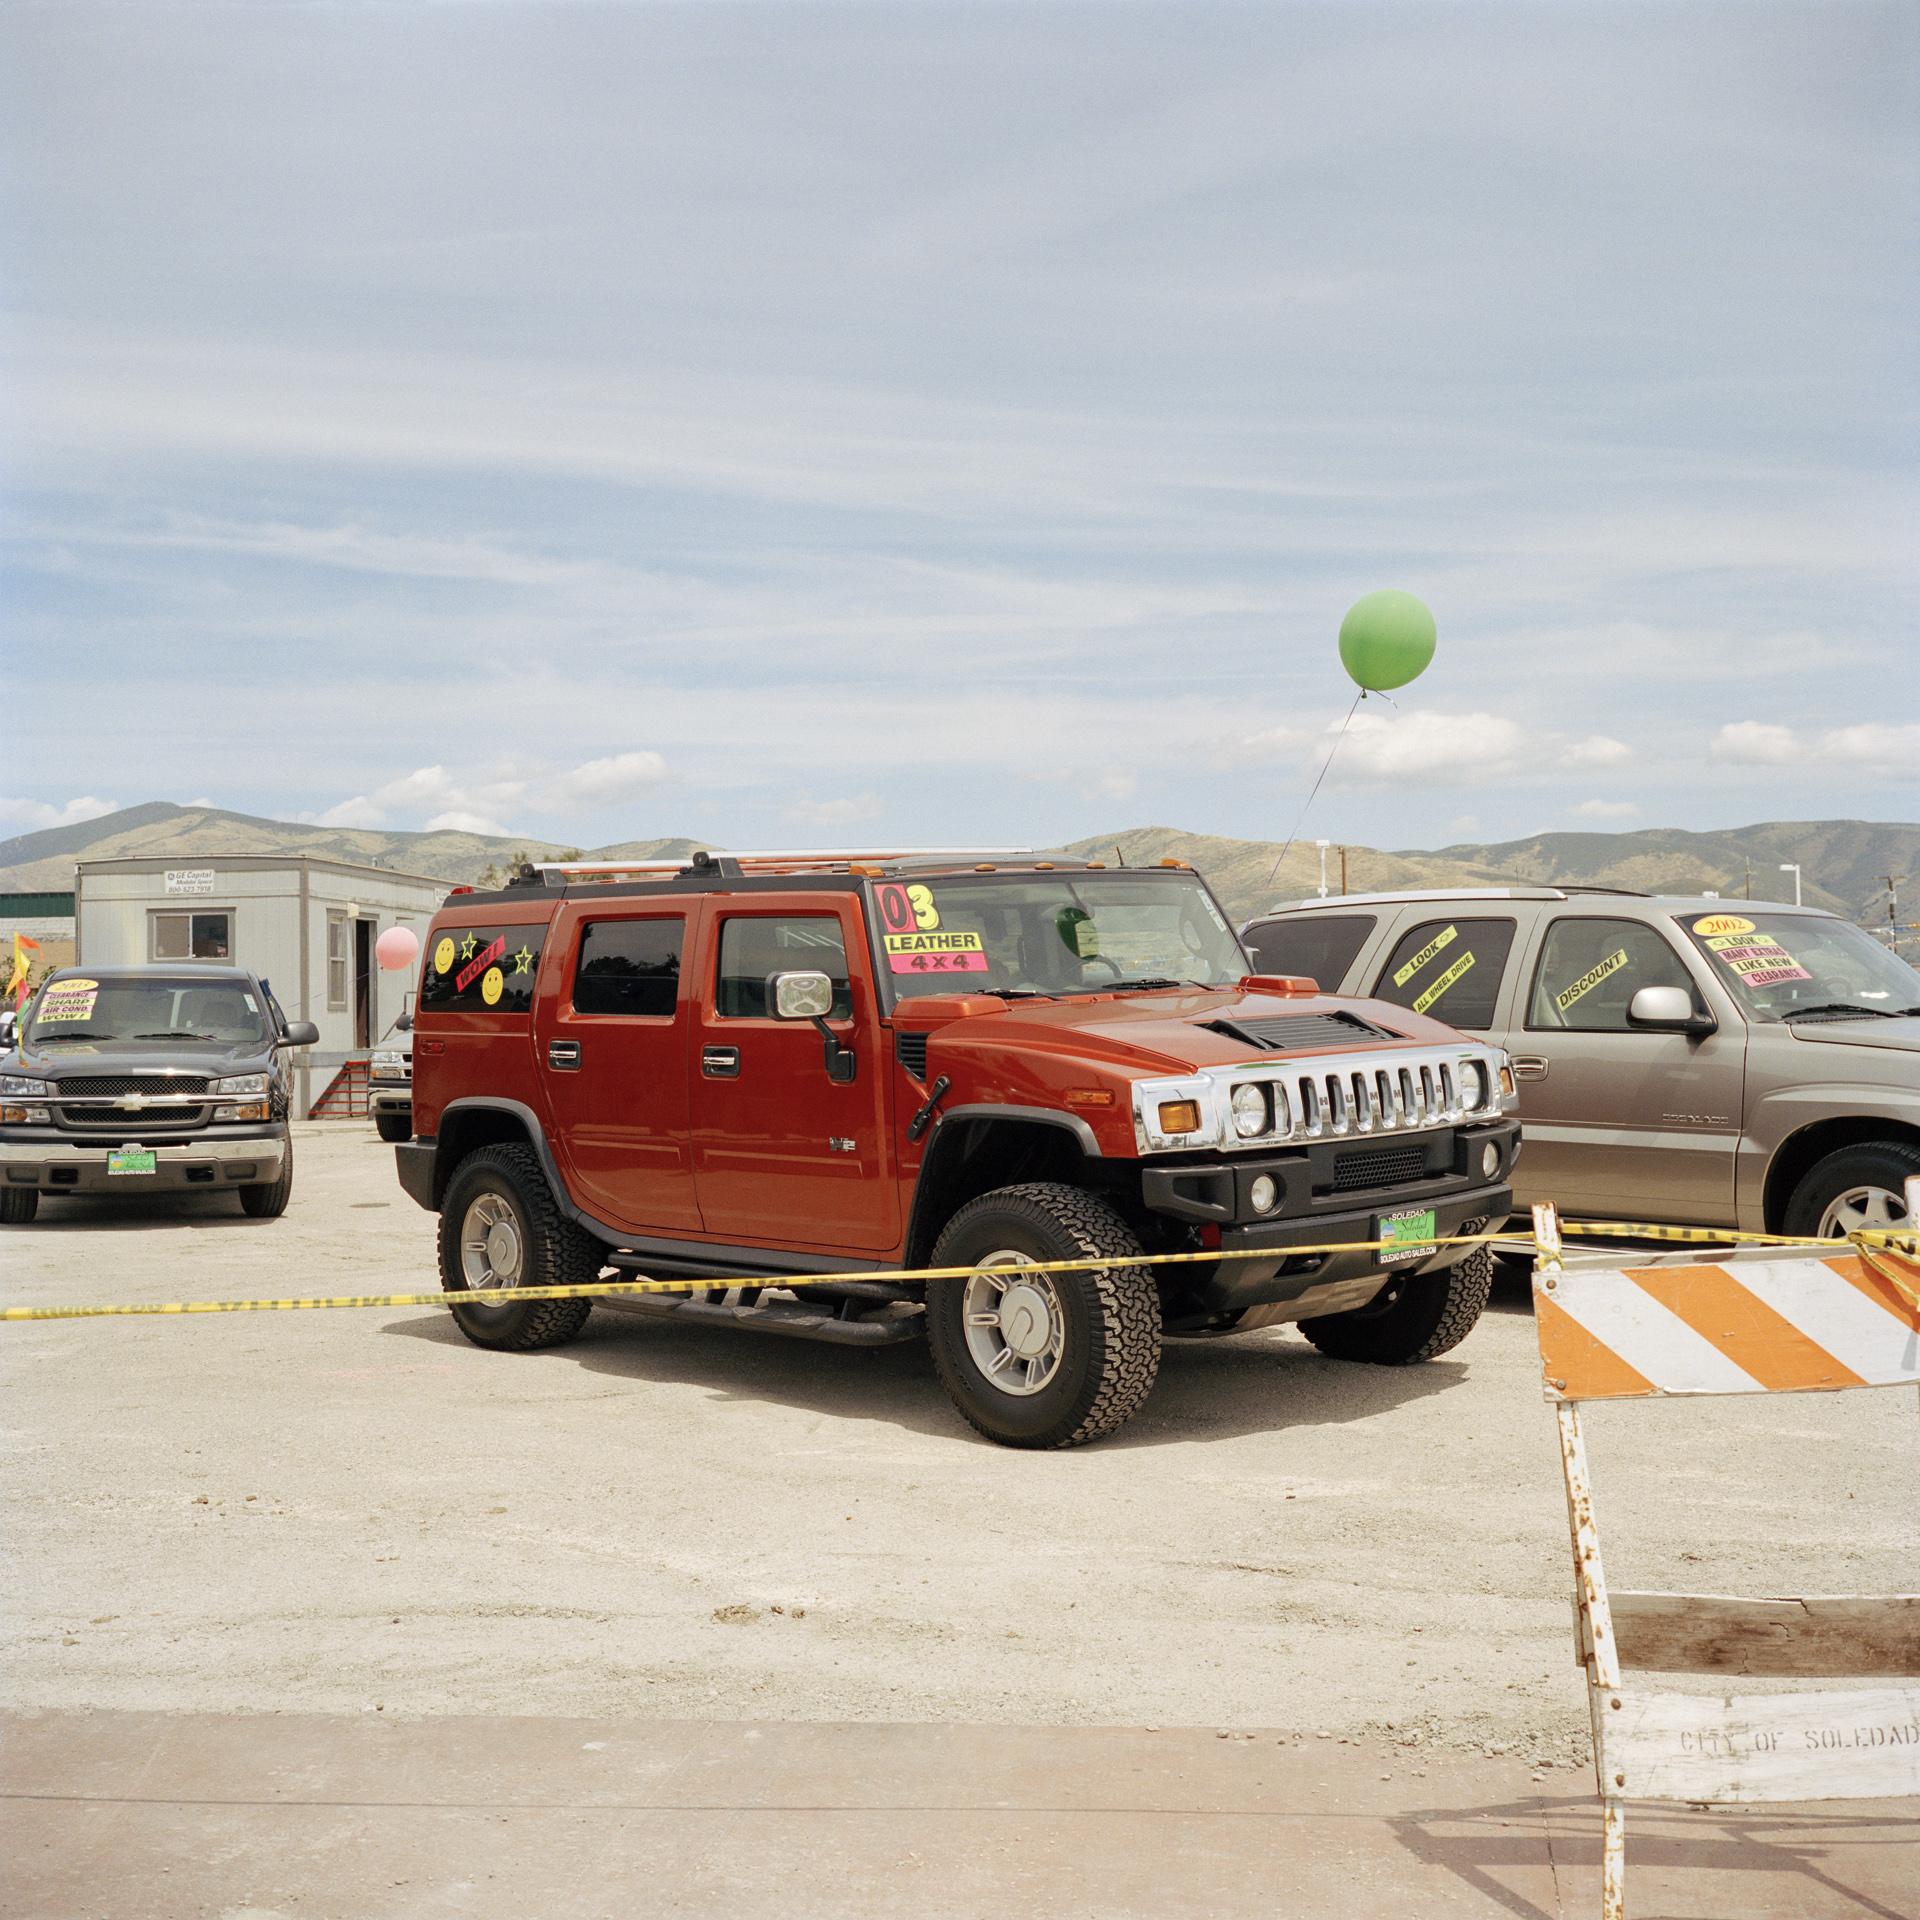 Soledad. Used 4x4 dealership. Hummer.